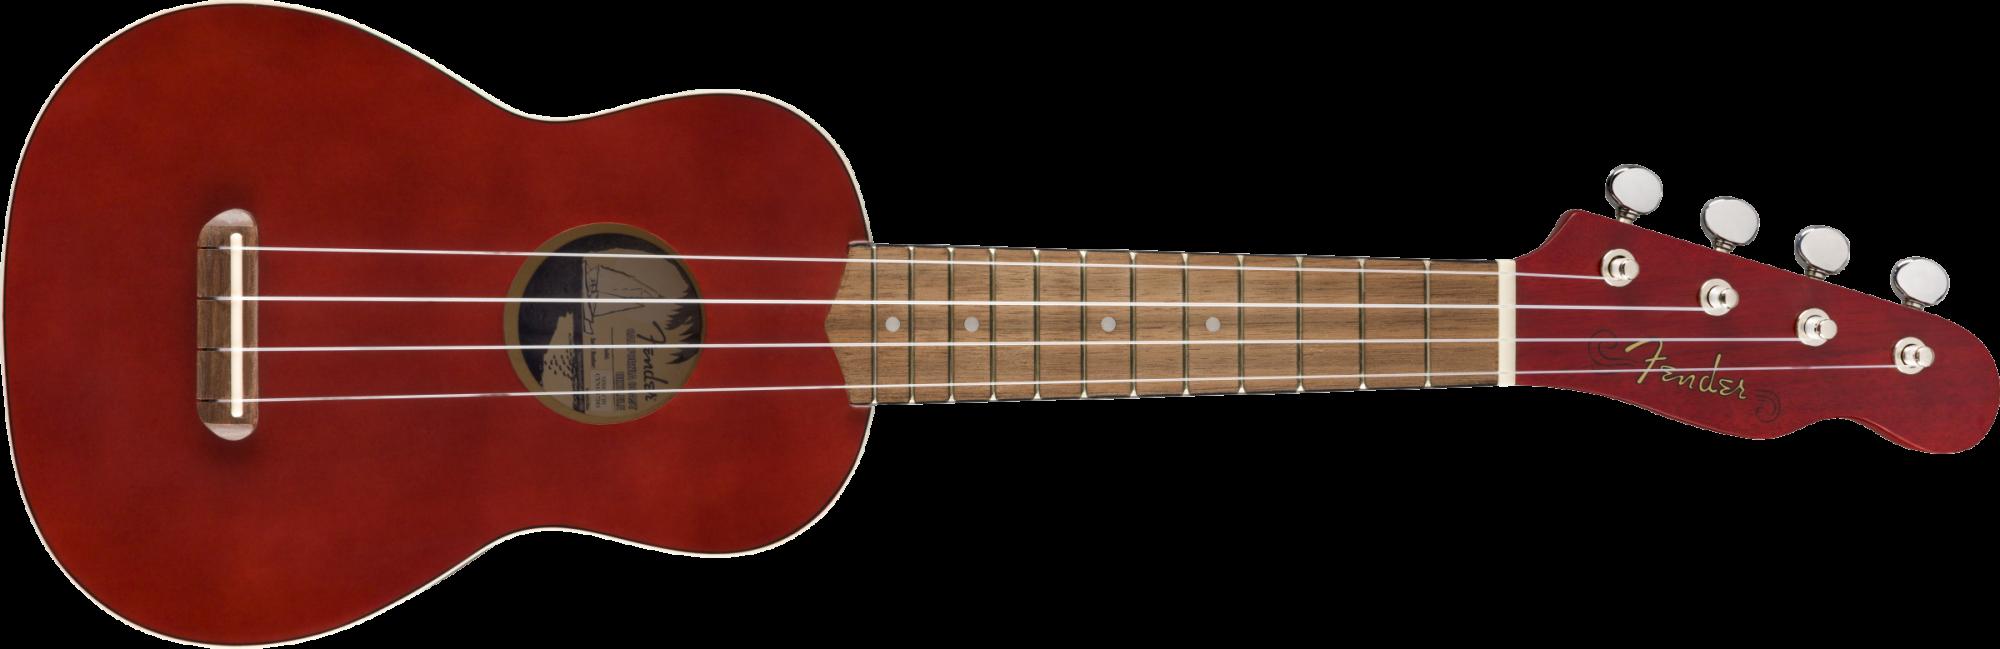 Fender Venice Soprano Ukulele Uke -Cherry